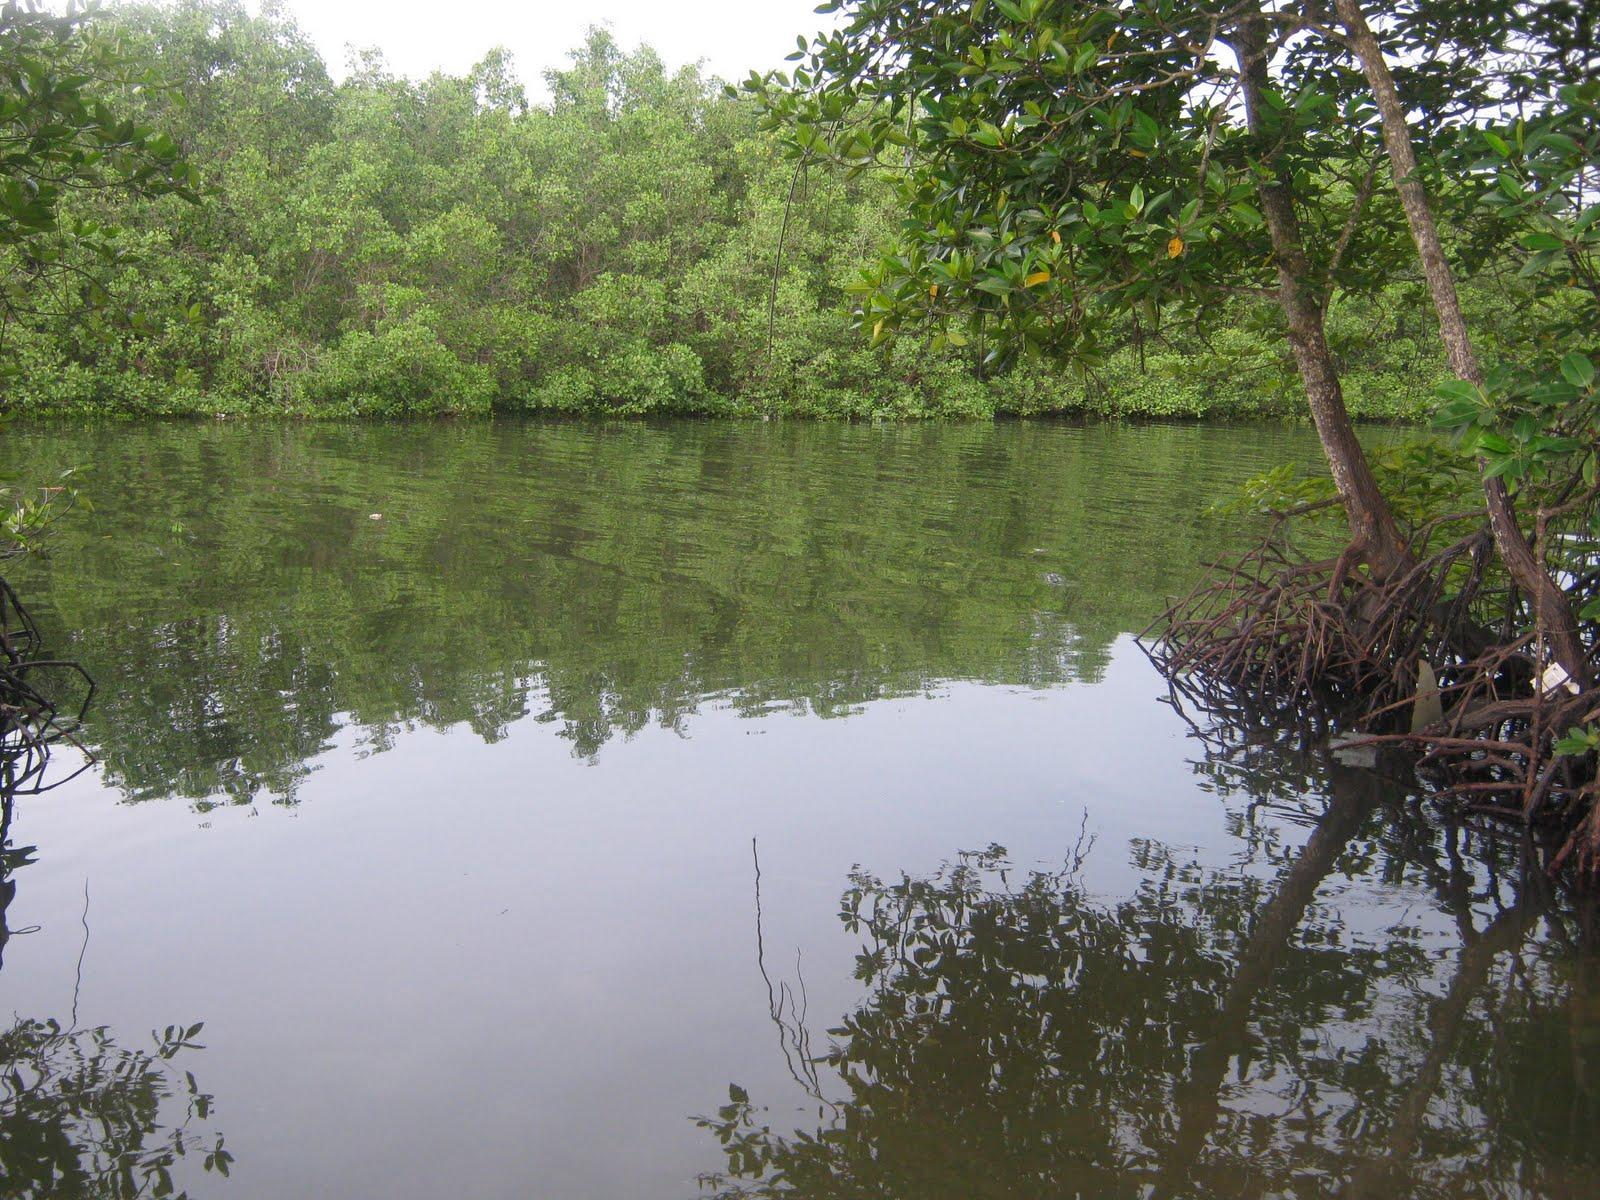 Kepentingan hutan paya bakau